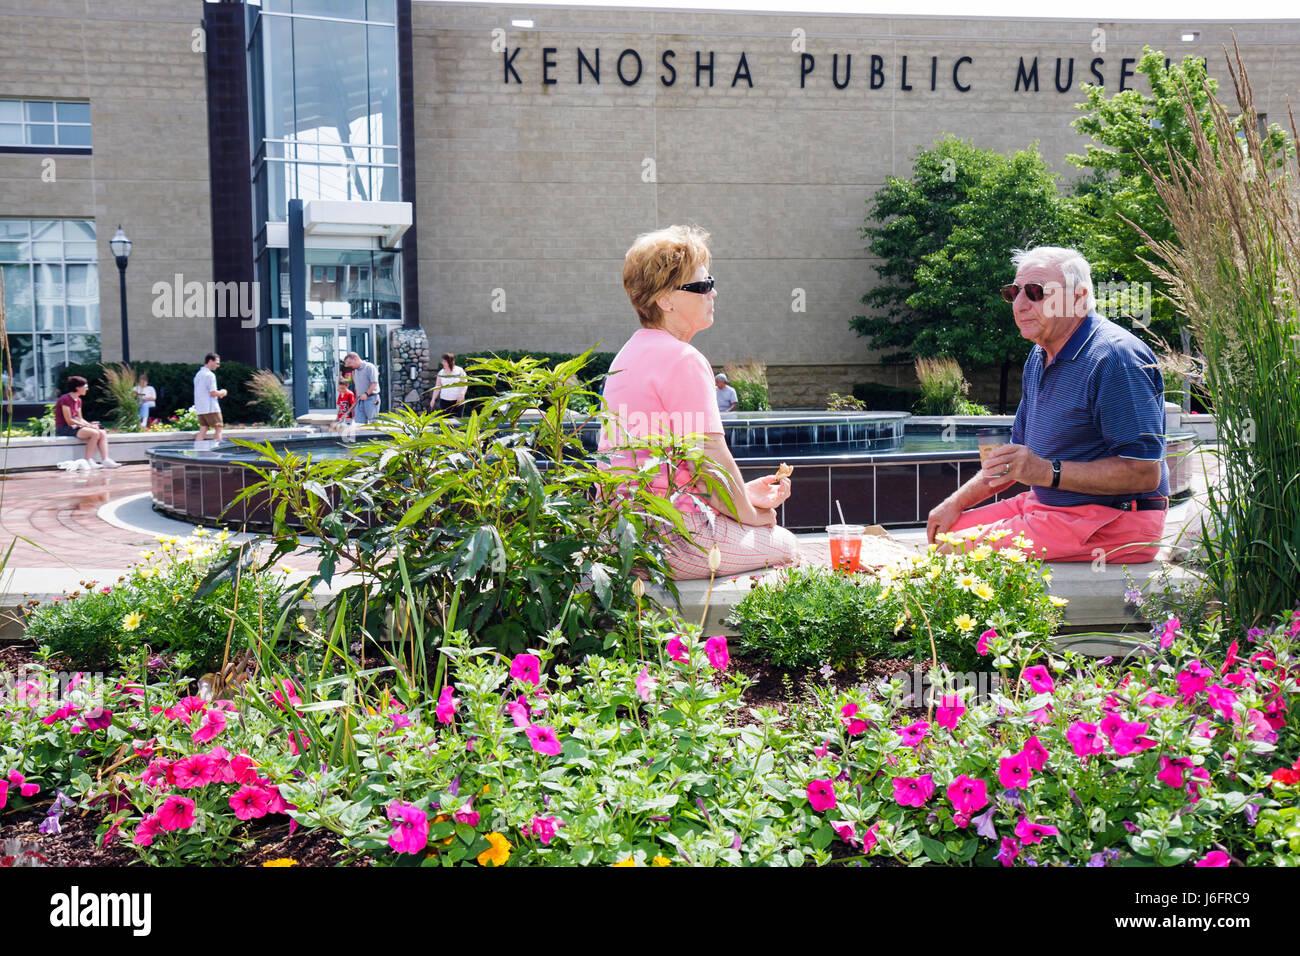 Wisconsin Kenosha Kenosha Public Museum man woman couple picnic flowers garden plaza summer - Stock Image